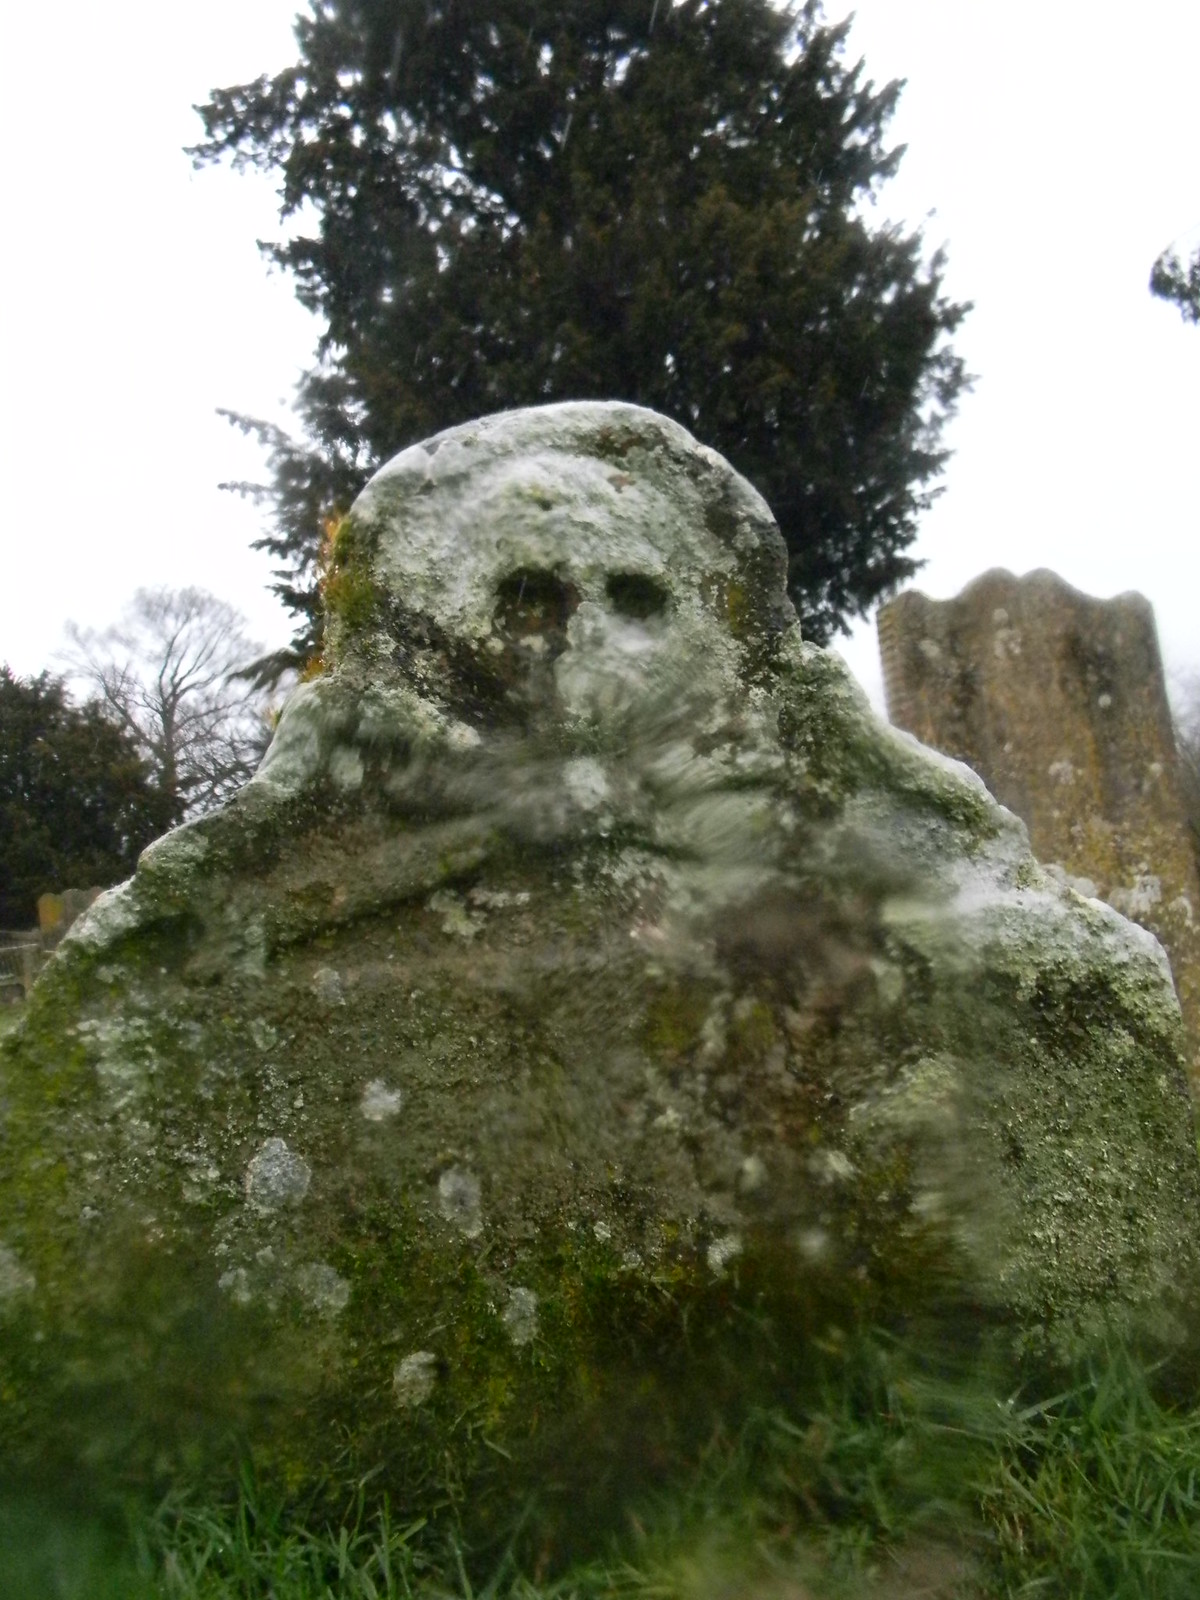 Smugglers gravestone, Burwash Stonegate to Robertsbridge